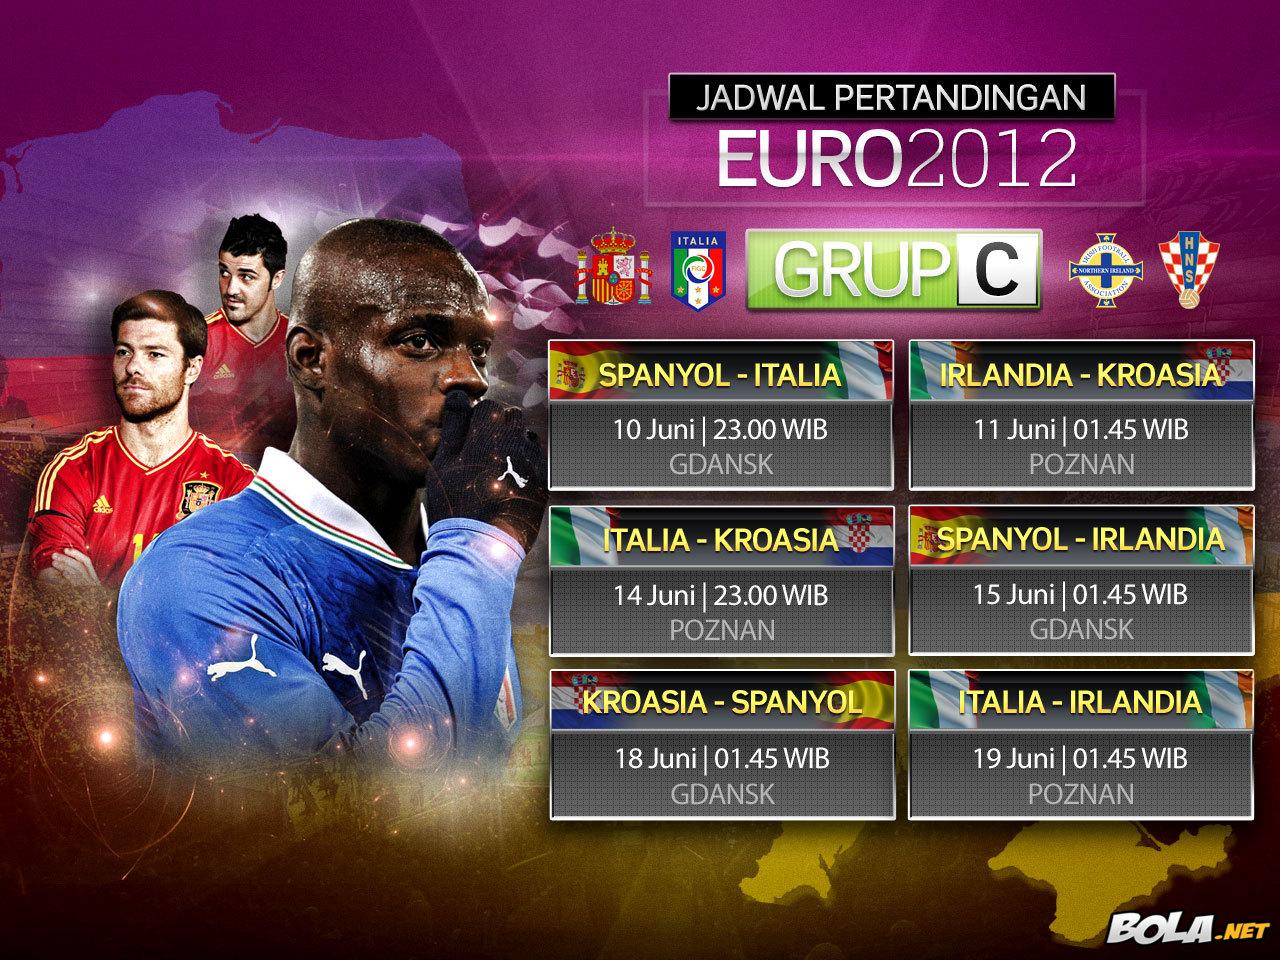 Jadwal Euro 2012 Grup C